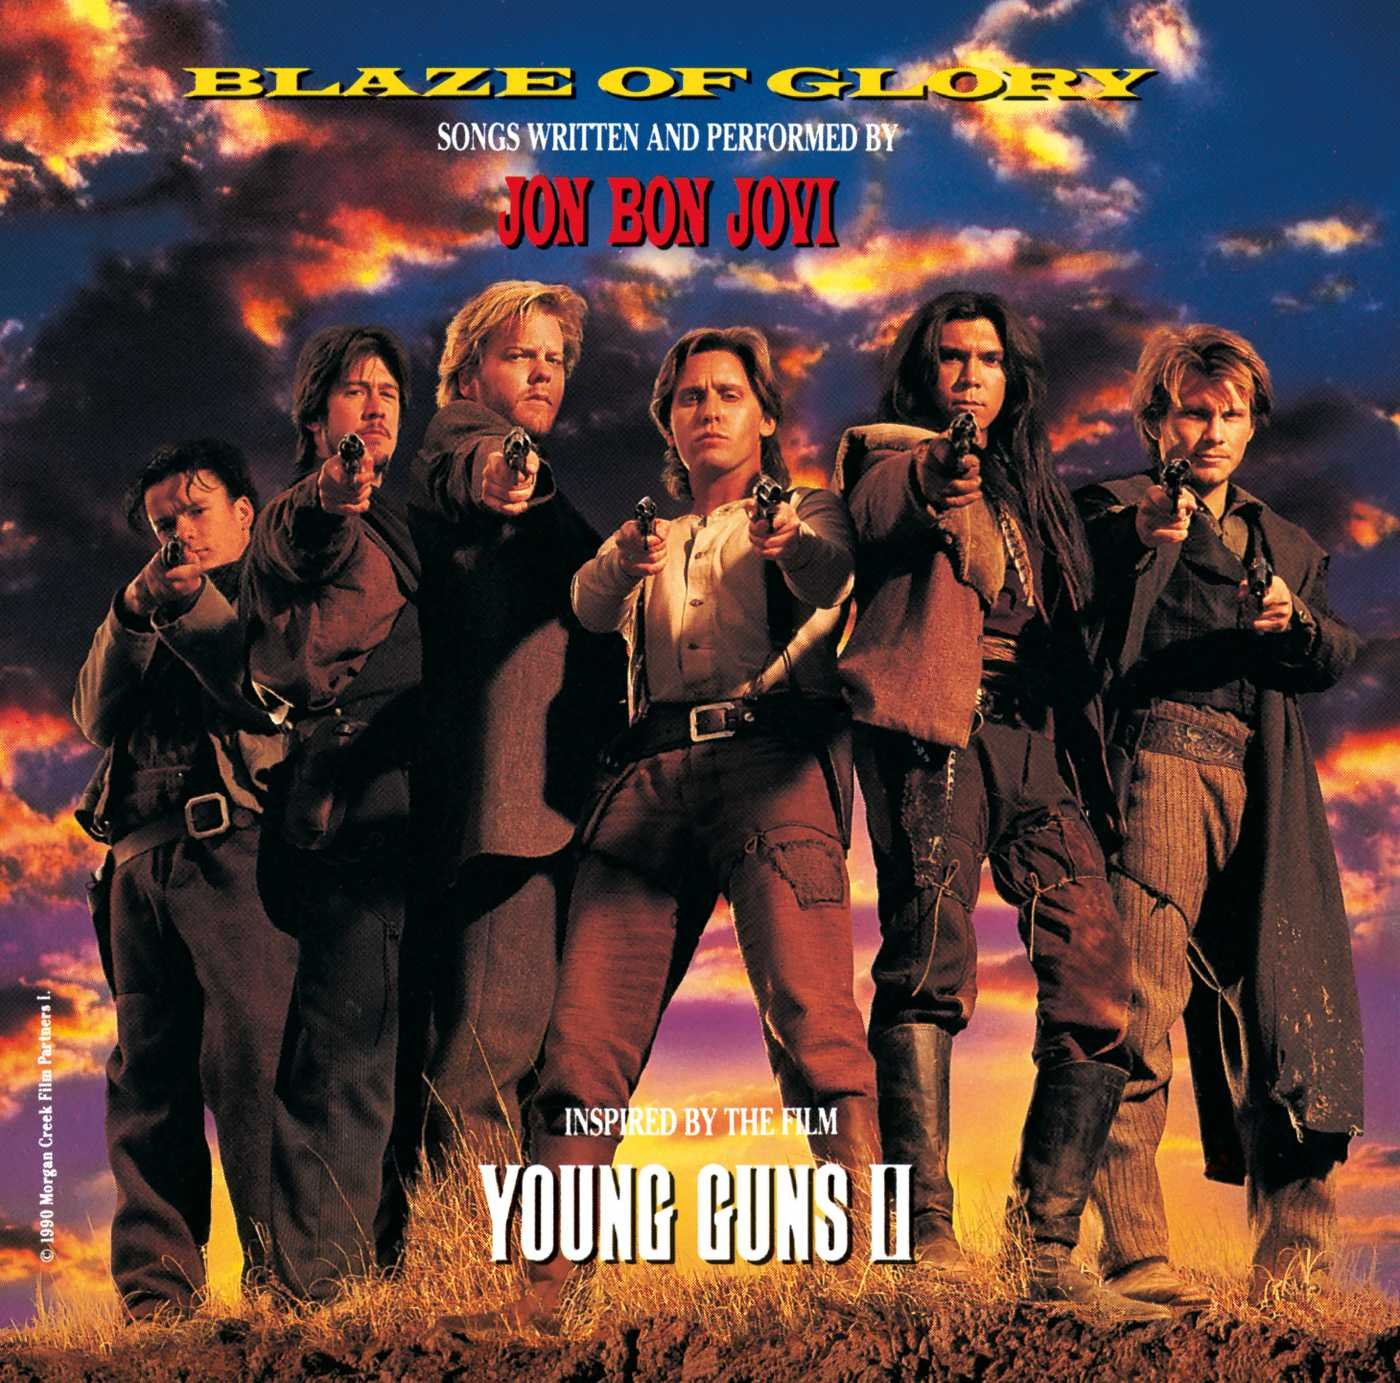 young guns echoes album download